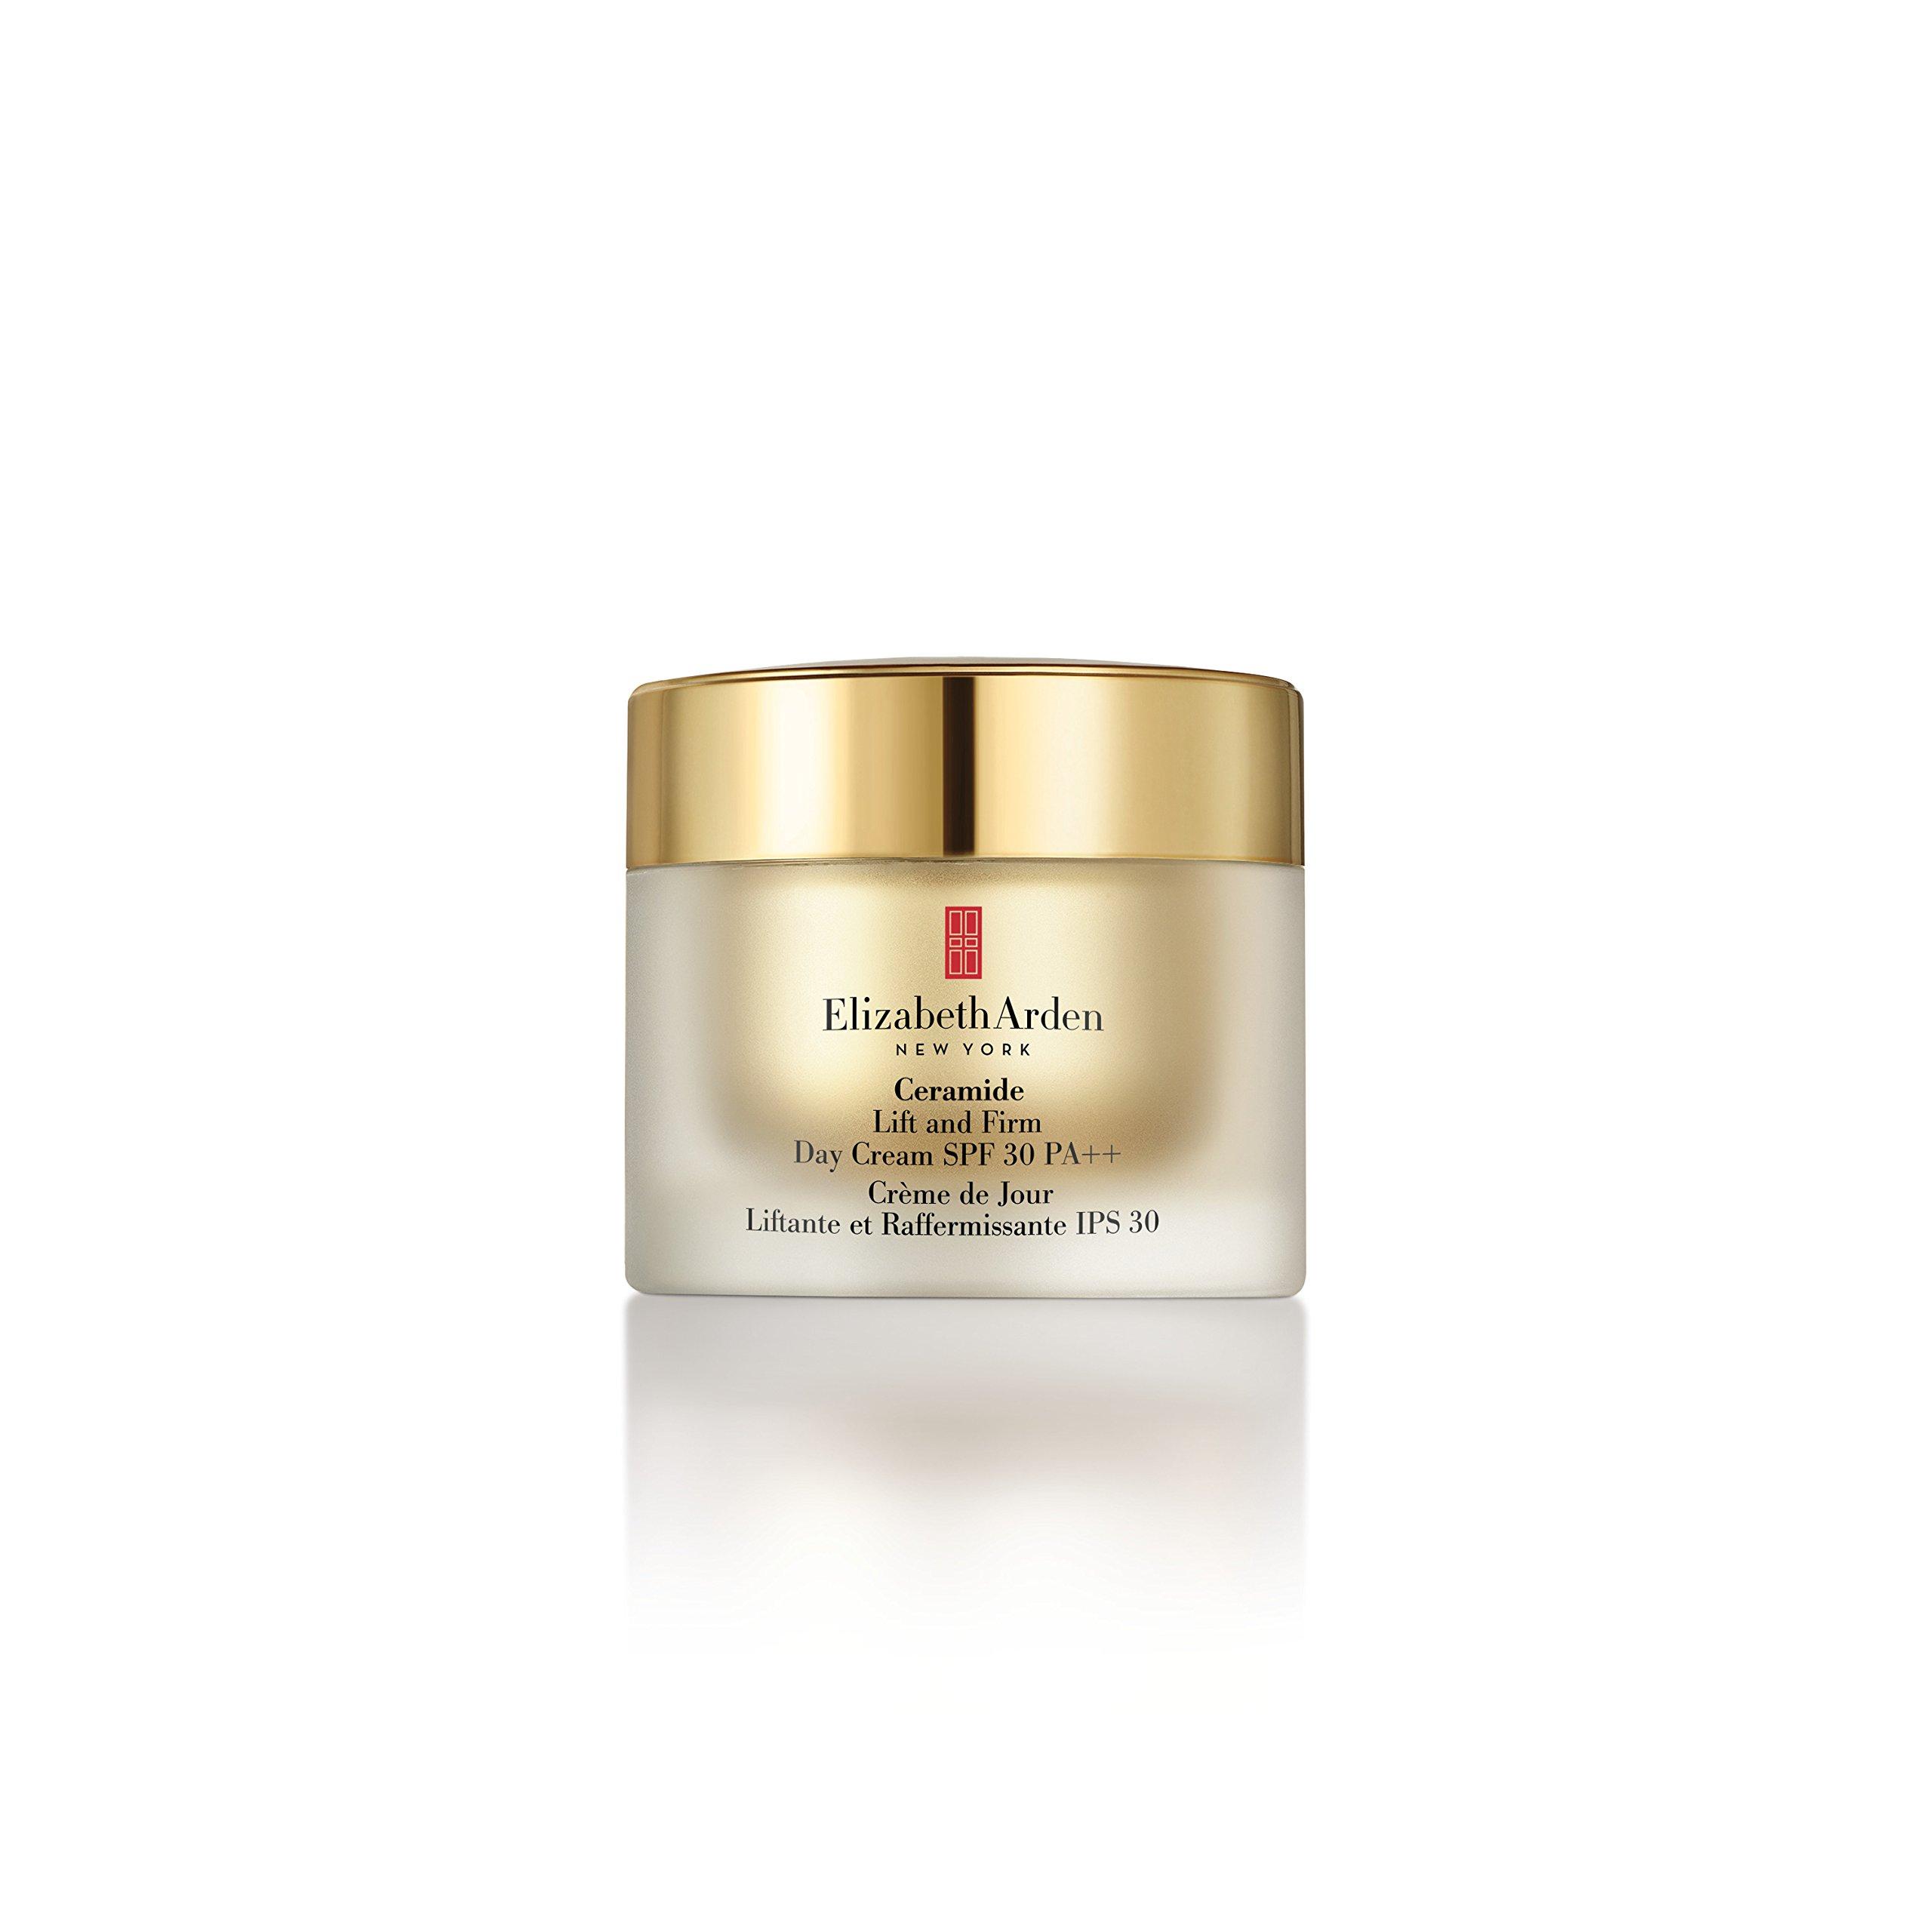 Elizabeth Arden Ceramide Lift and Firm Day Cream Broad Spectrum Sunscreen SPF 30, 1.7 oz. by Elizabeth Arden (Image #1)